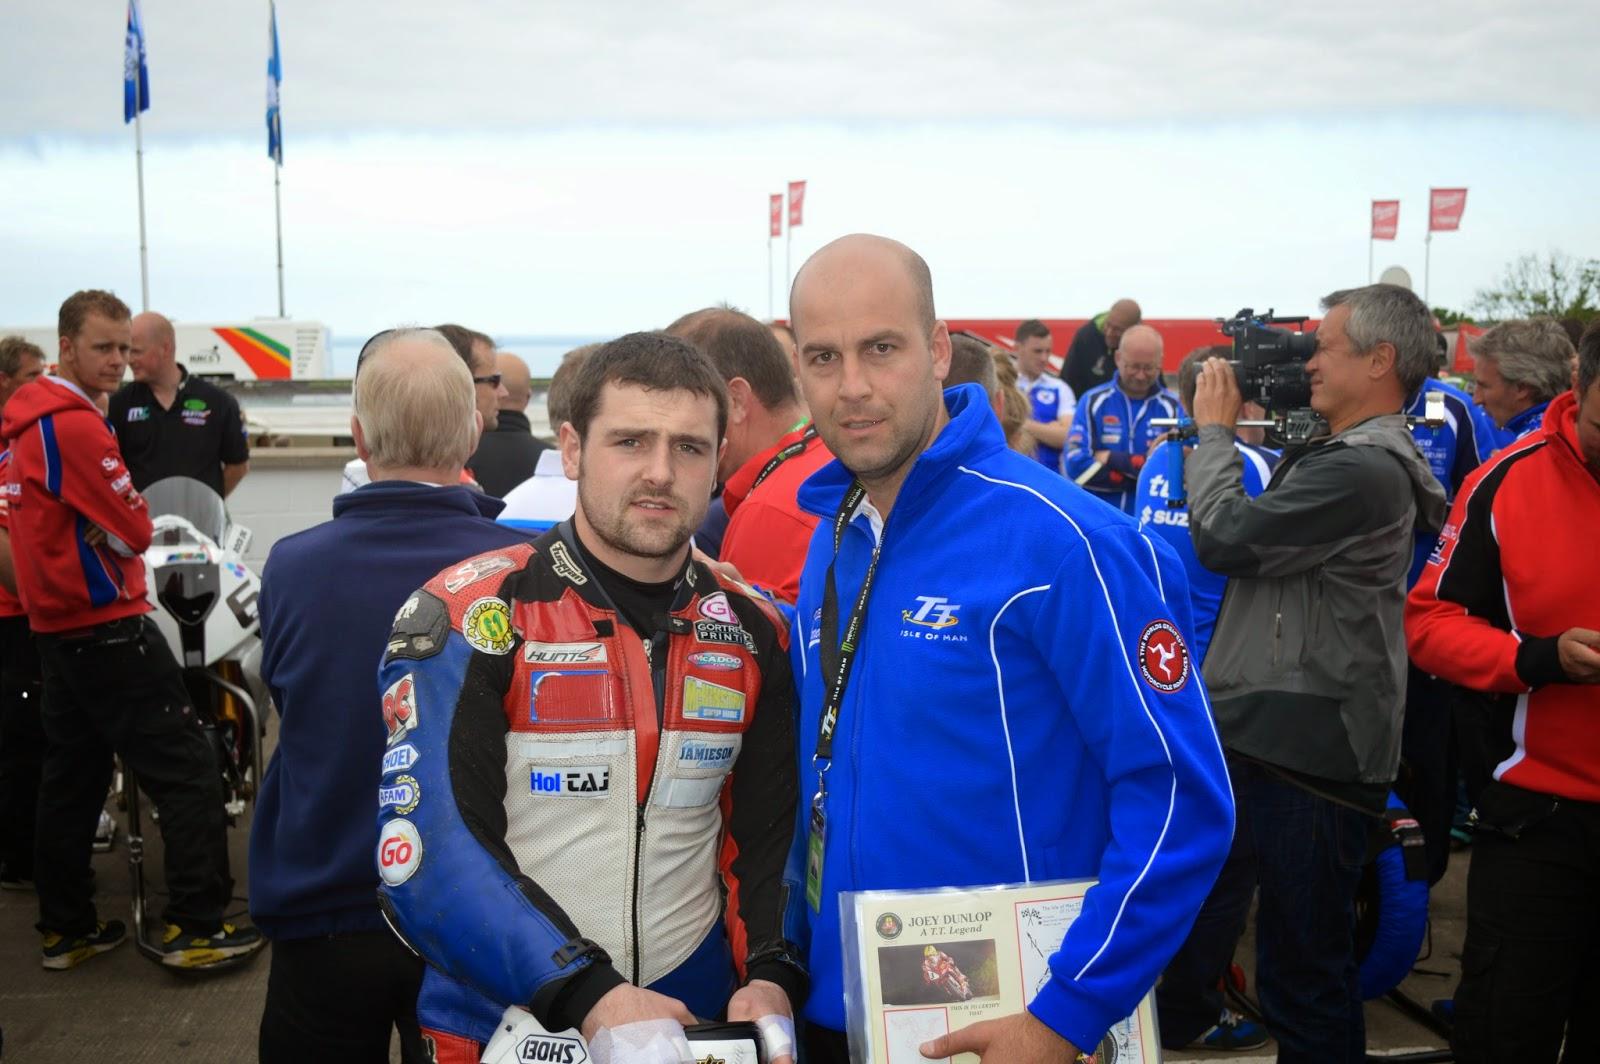 Michael Dunlop TT Isla de Man